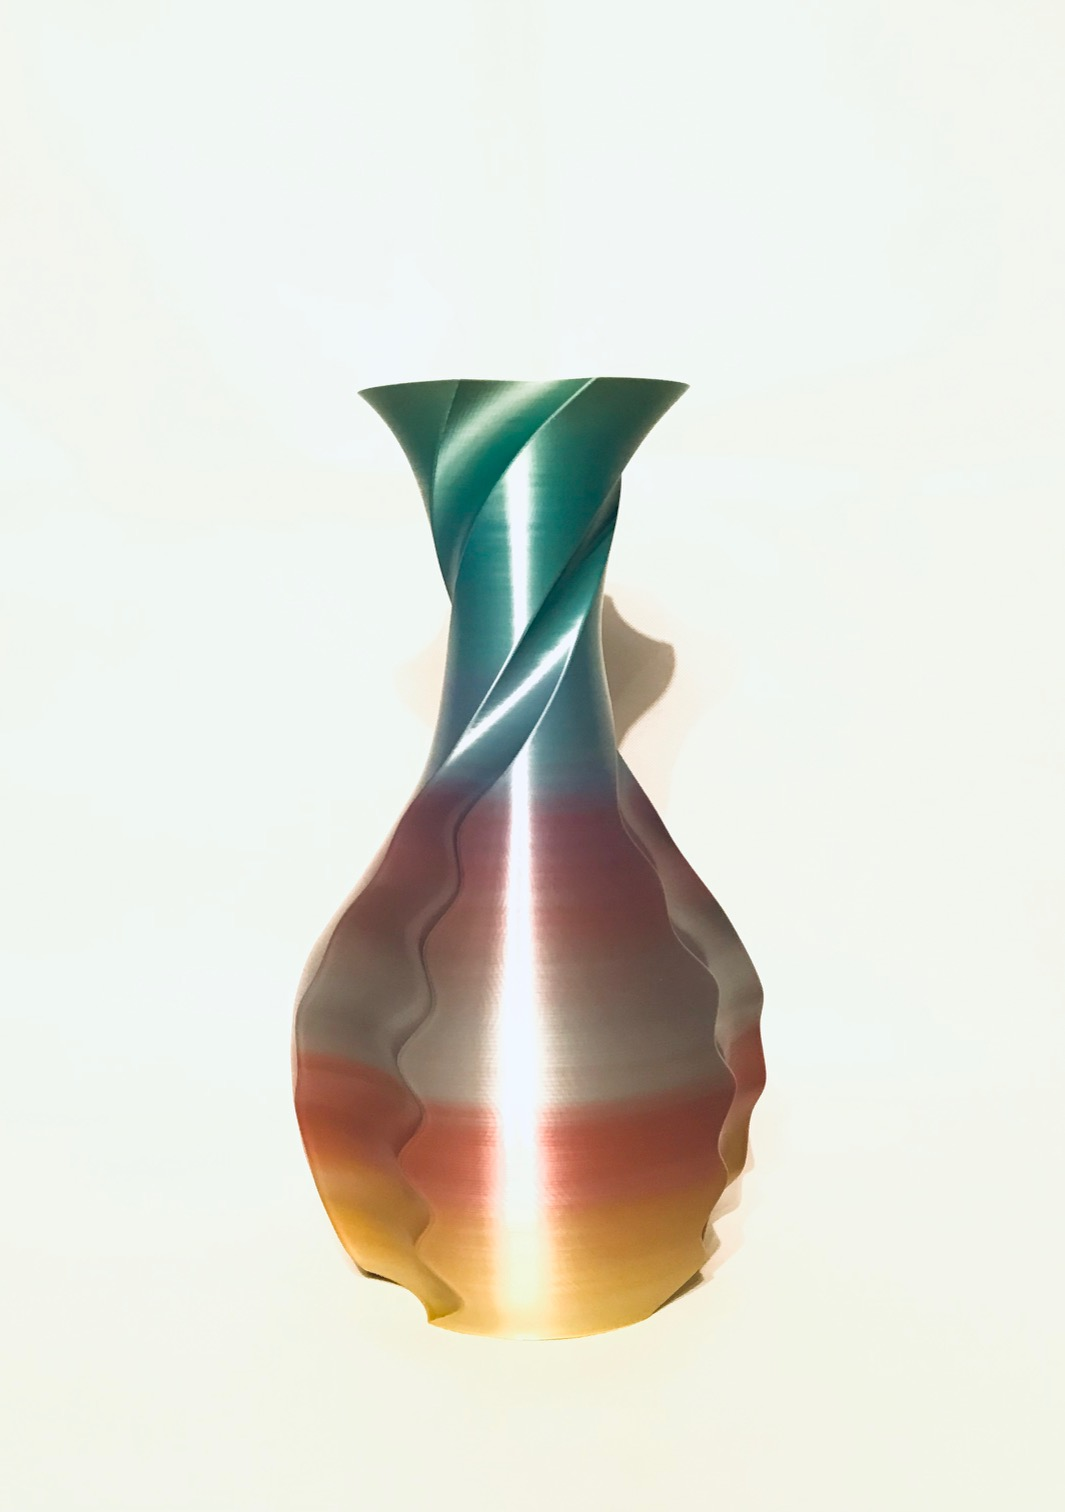 IMG_5300.jpg Download free STL file Shake & twist vase • 3D printable design, Brithawkes